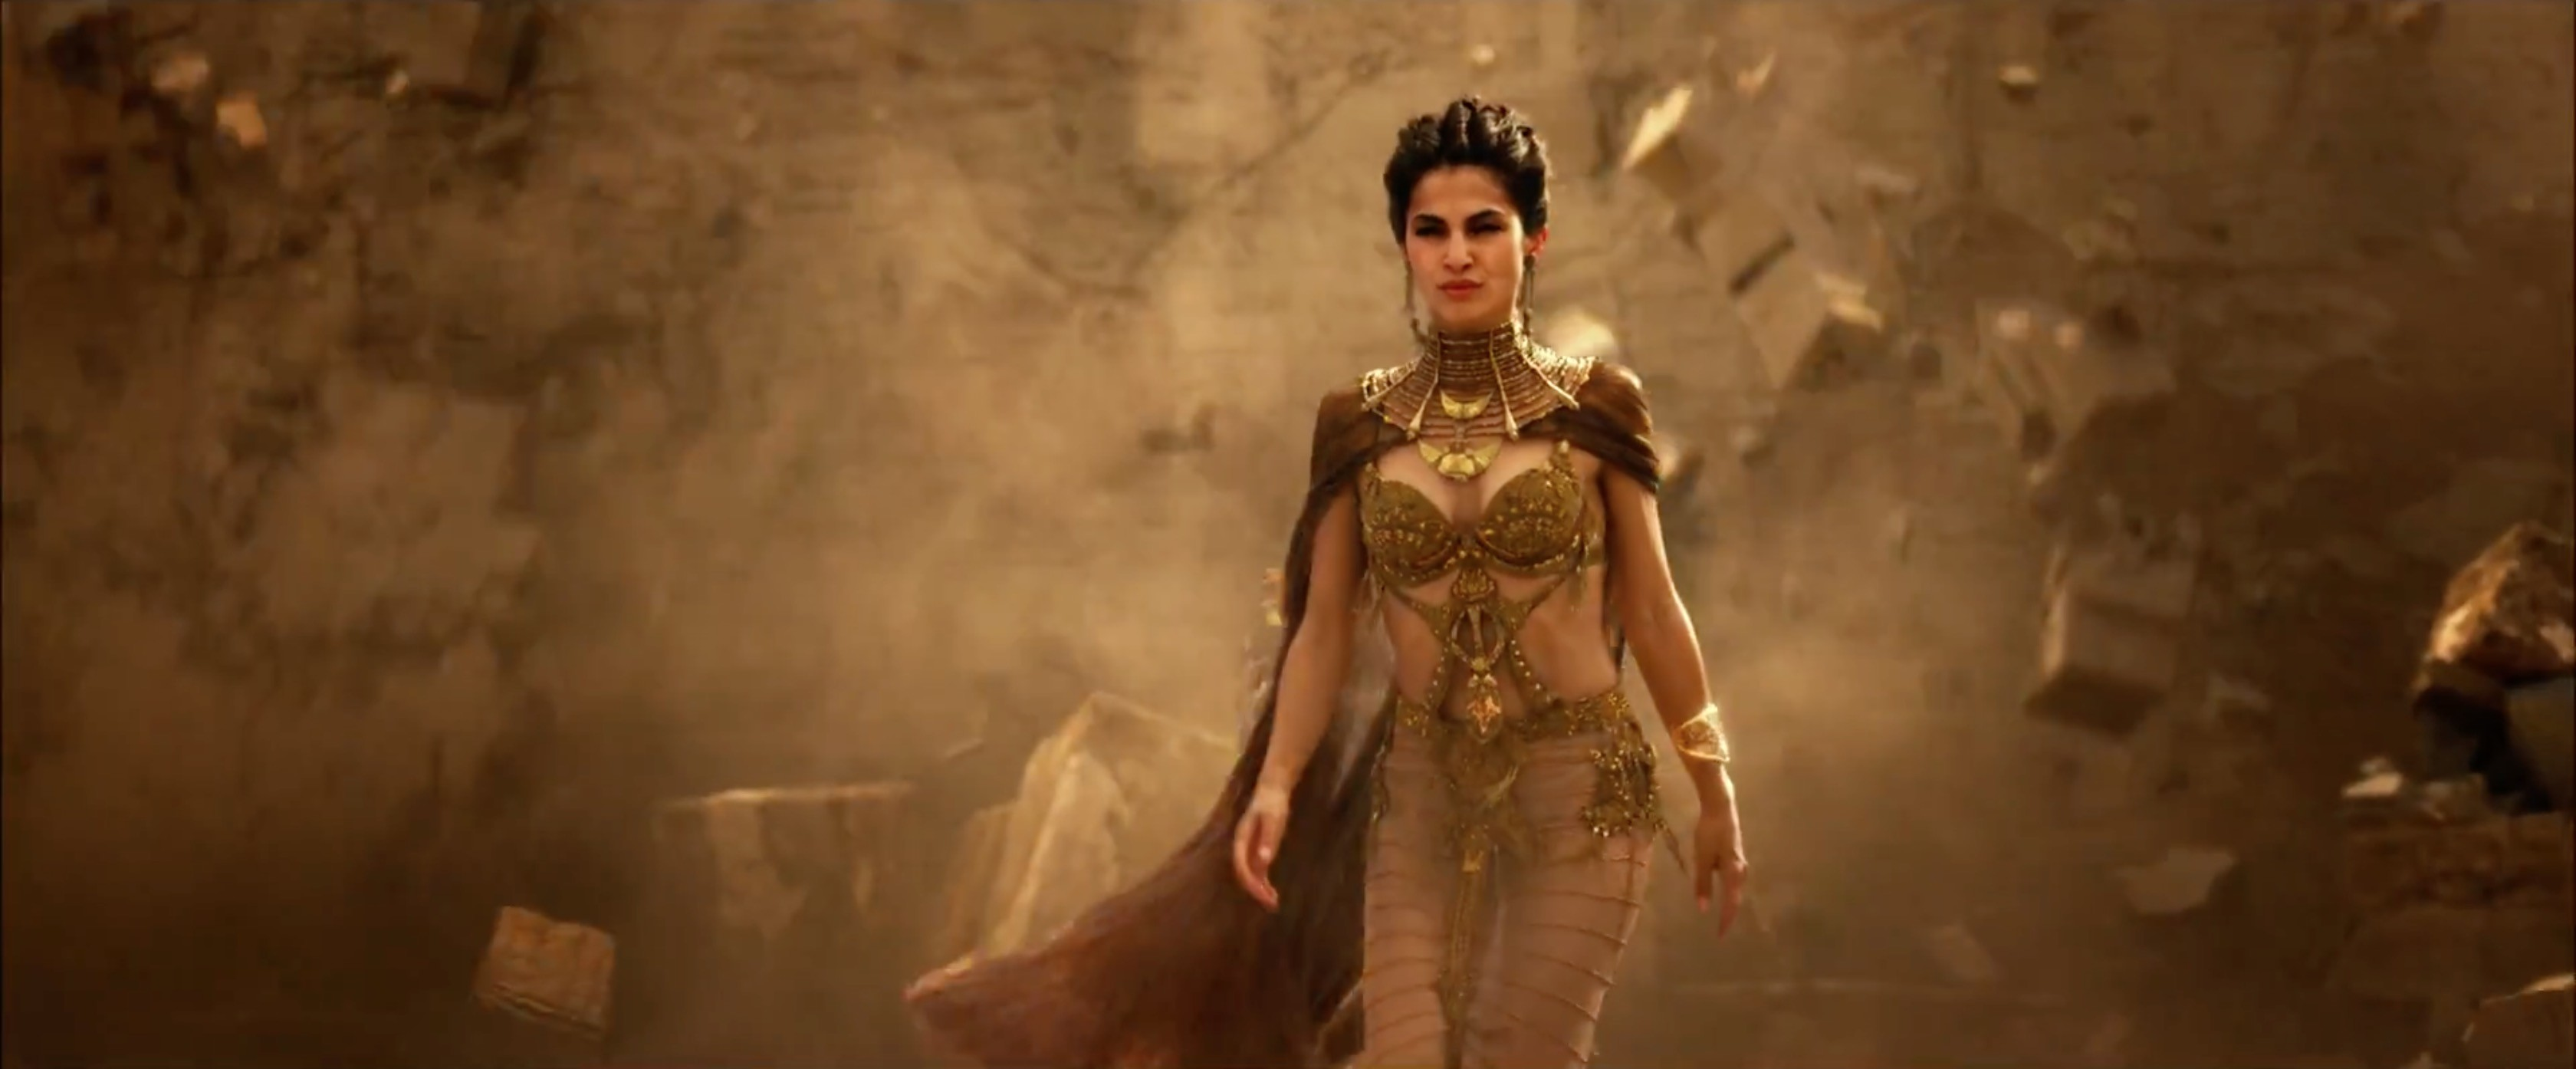 Gods of Egypt Backgrounds